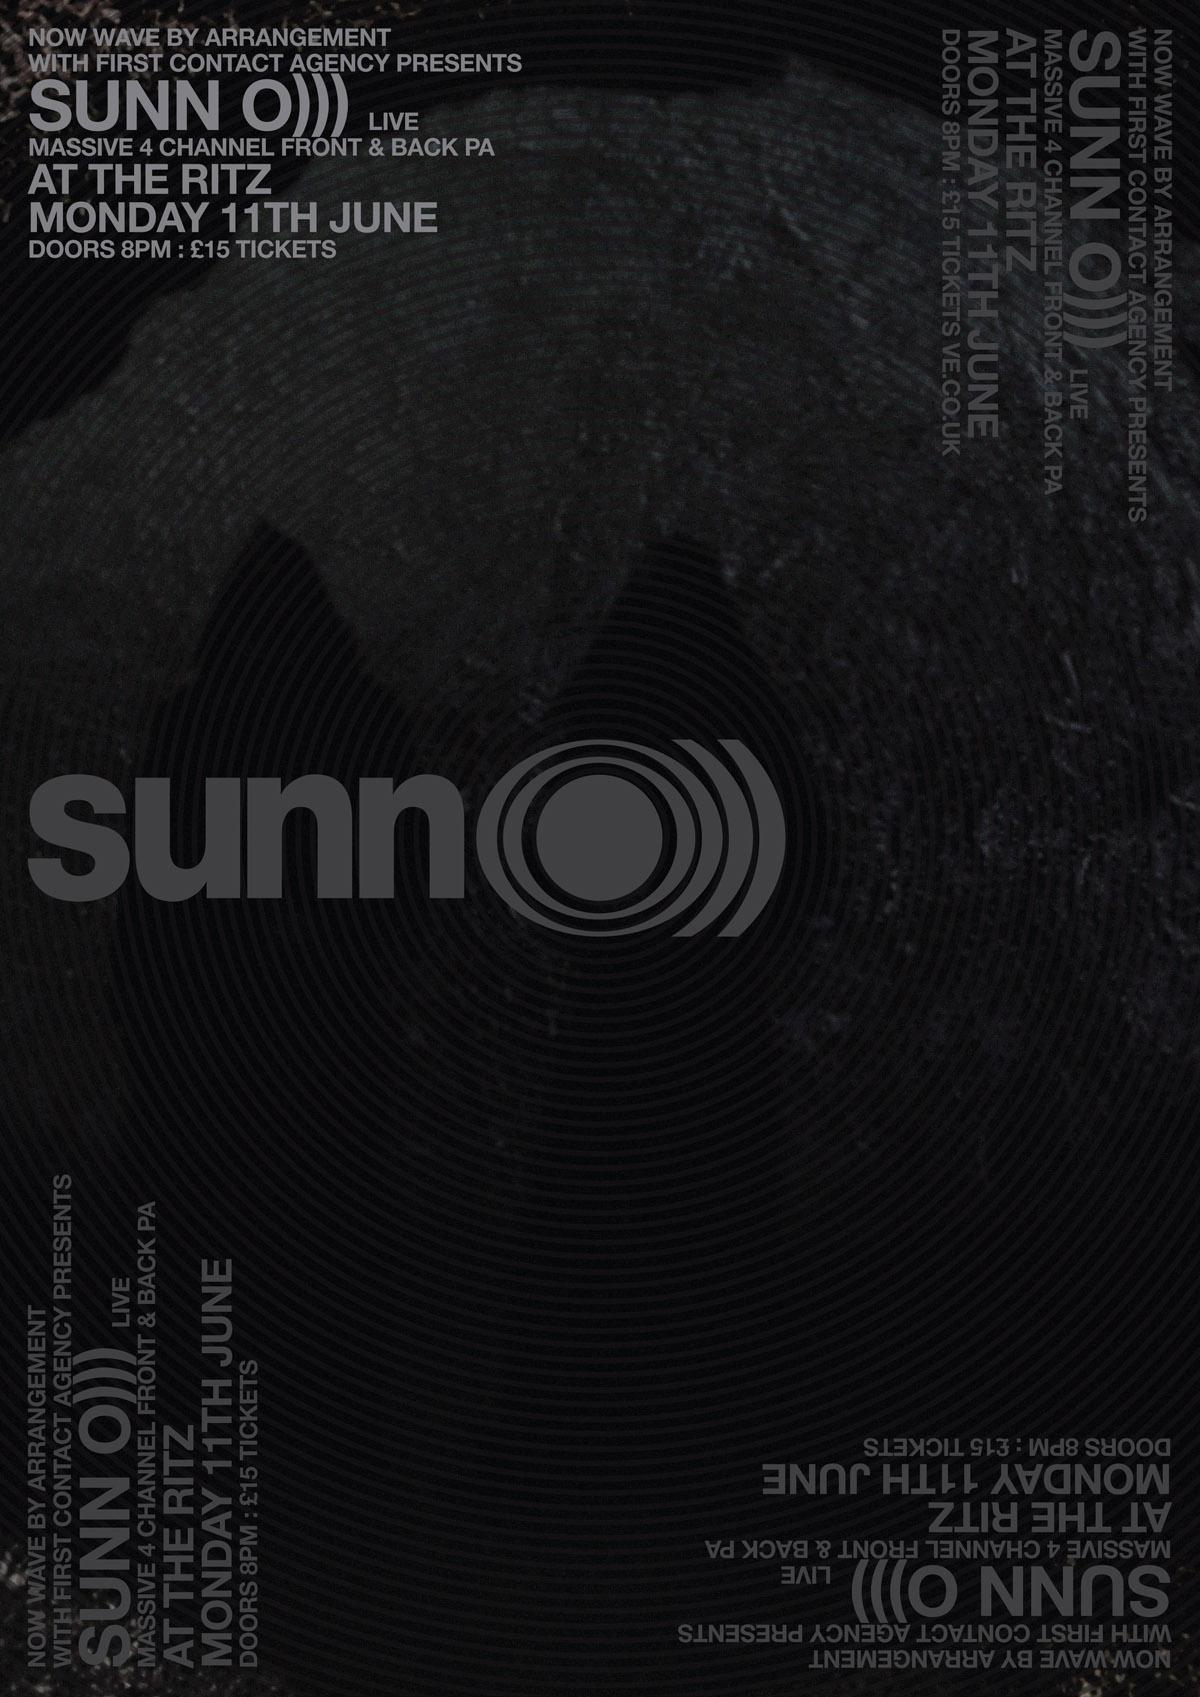 SUNN O))) Manchester June 2012 poster